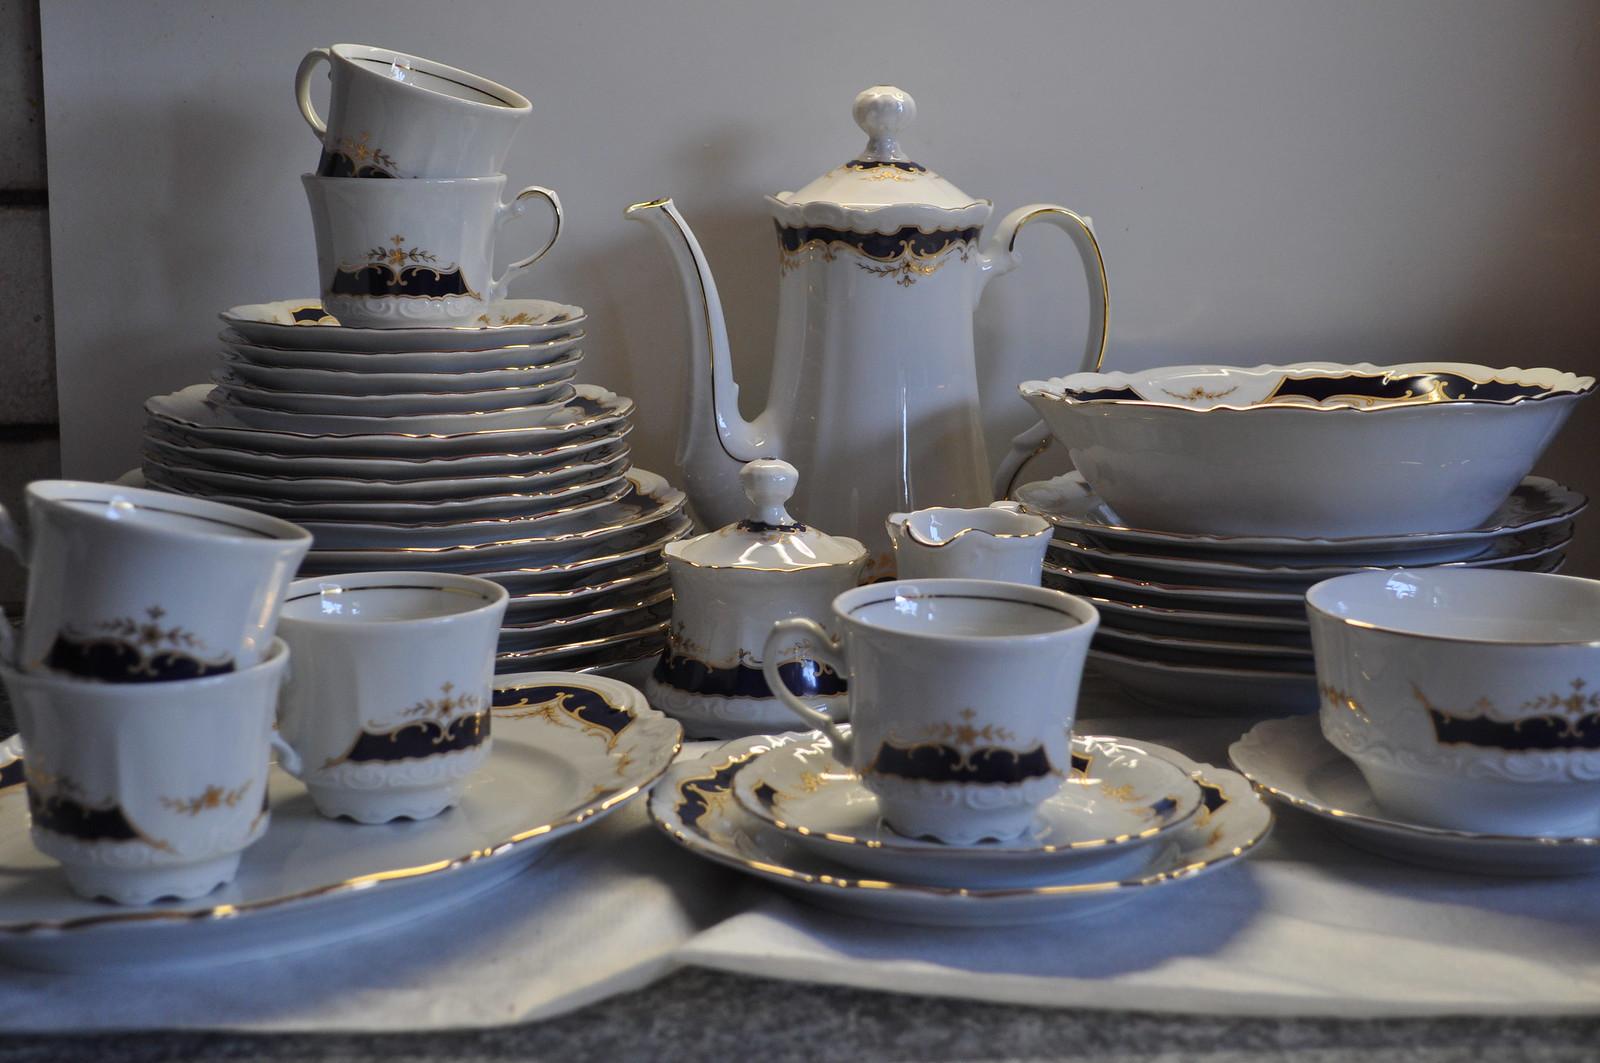 kaffee und essgeschirr 36 tlg k nig ludwig bavaria germany ebay. Black Bedroom Furniture Sets. Home Design Ideas